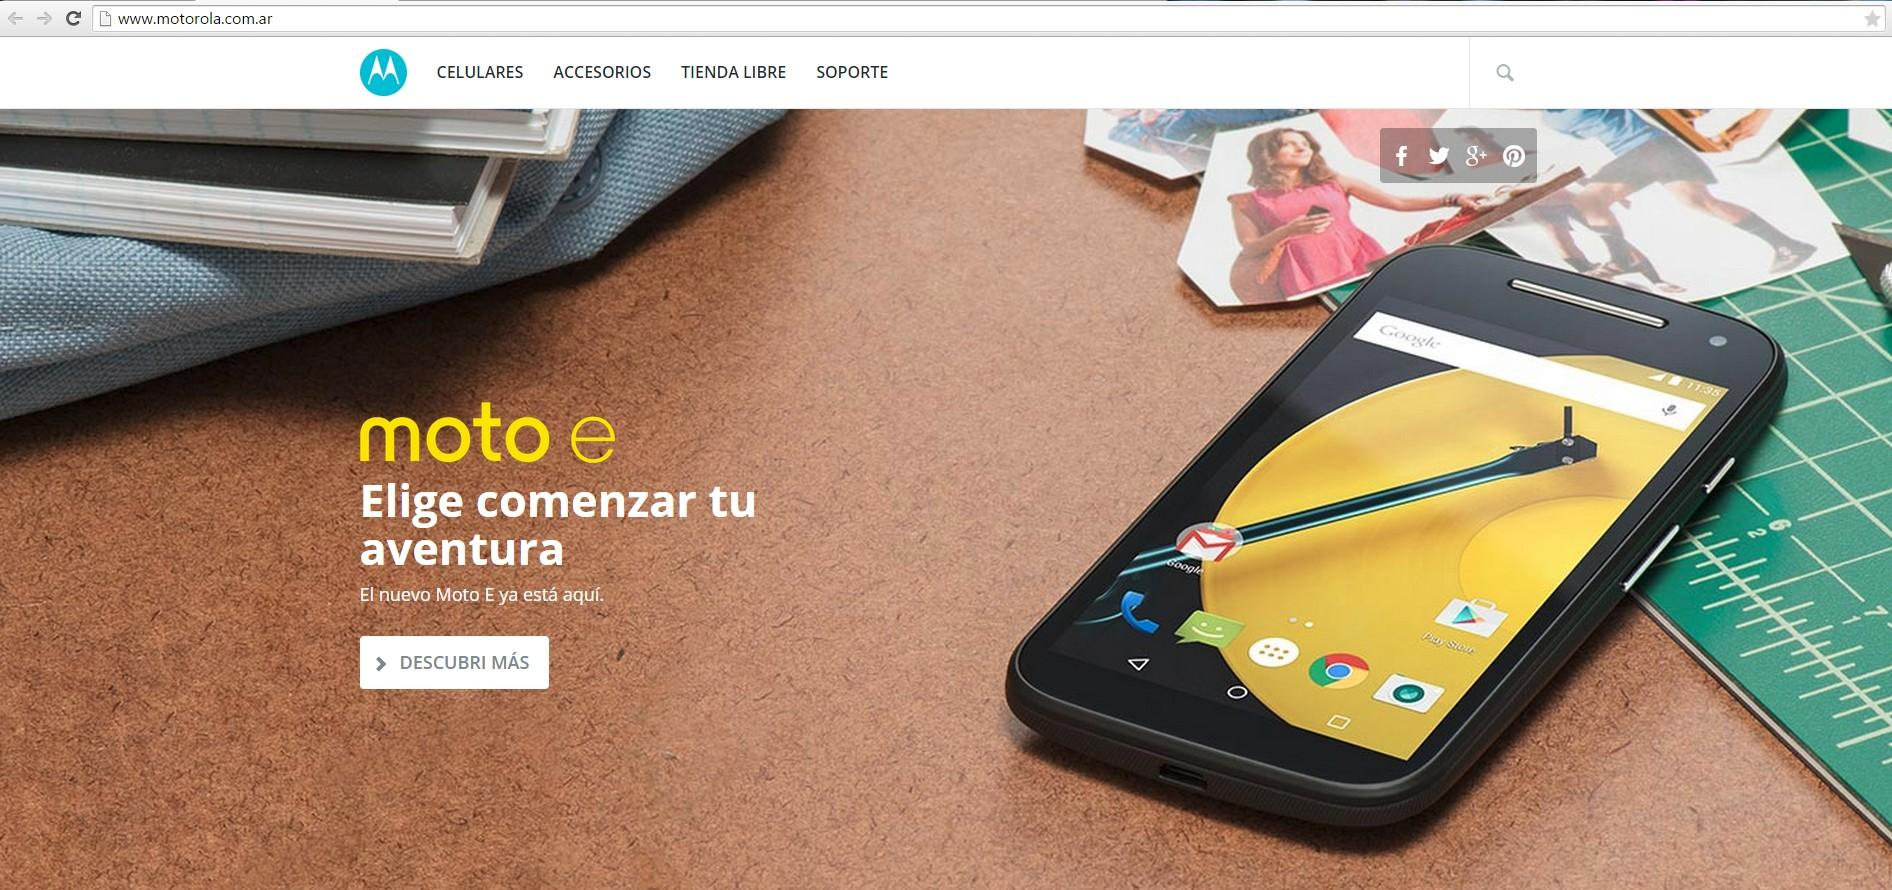 Motorola-01-culturageek.com.ar